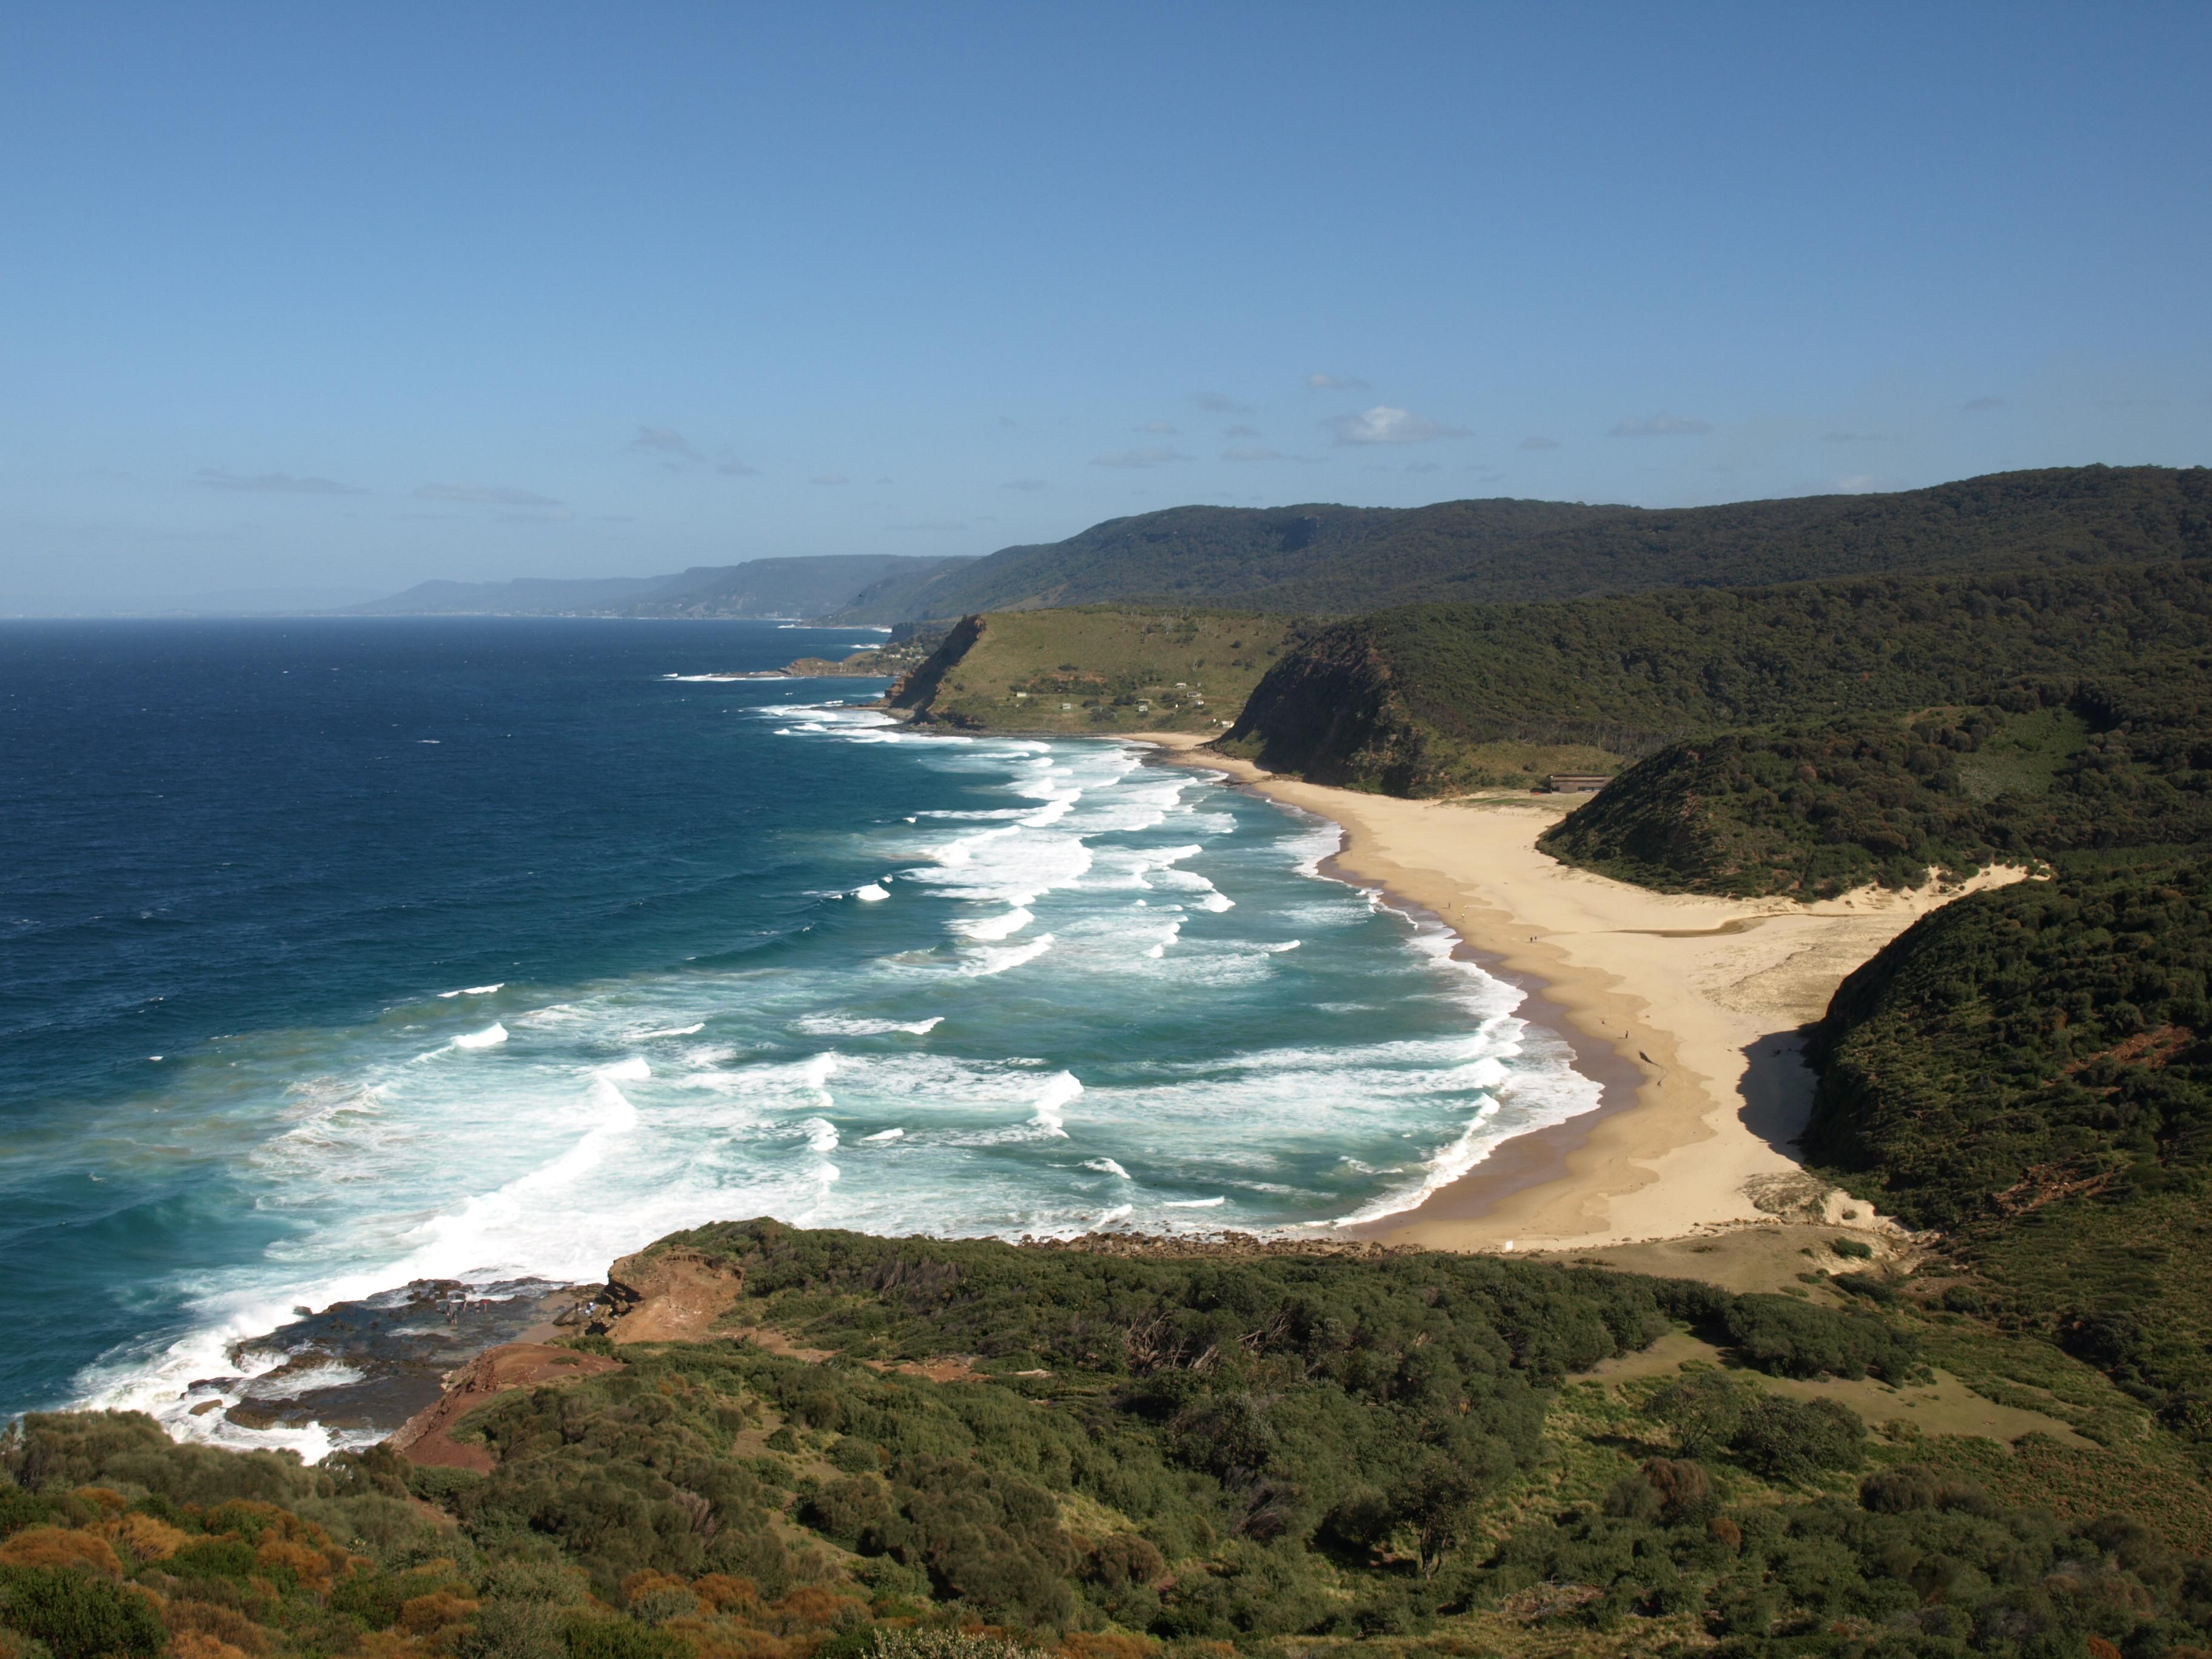 sydney royal national park history list - photo#15